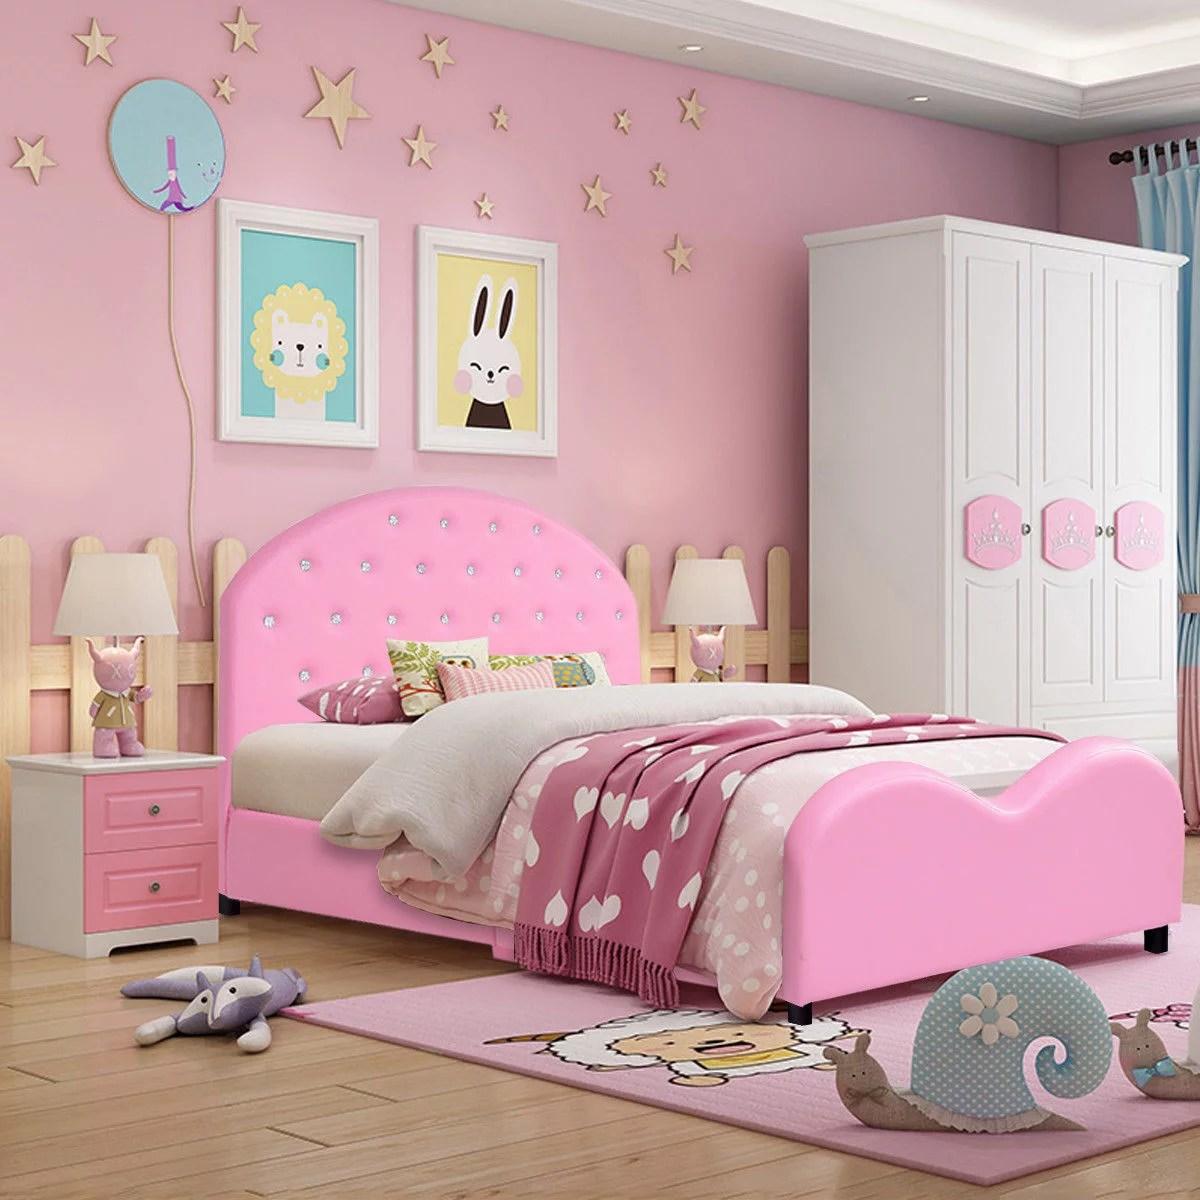 Costway Kids Children Pu Upholstered Platform Wooden Princess Bed Bedroom Furniture Pink Walmart Com Walmart Com